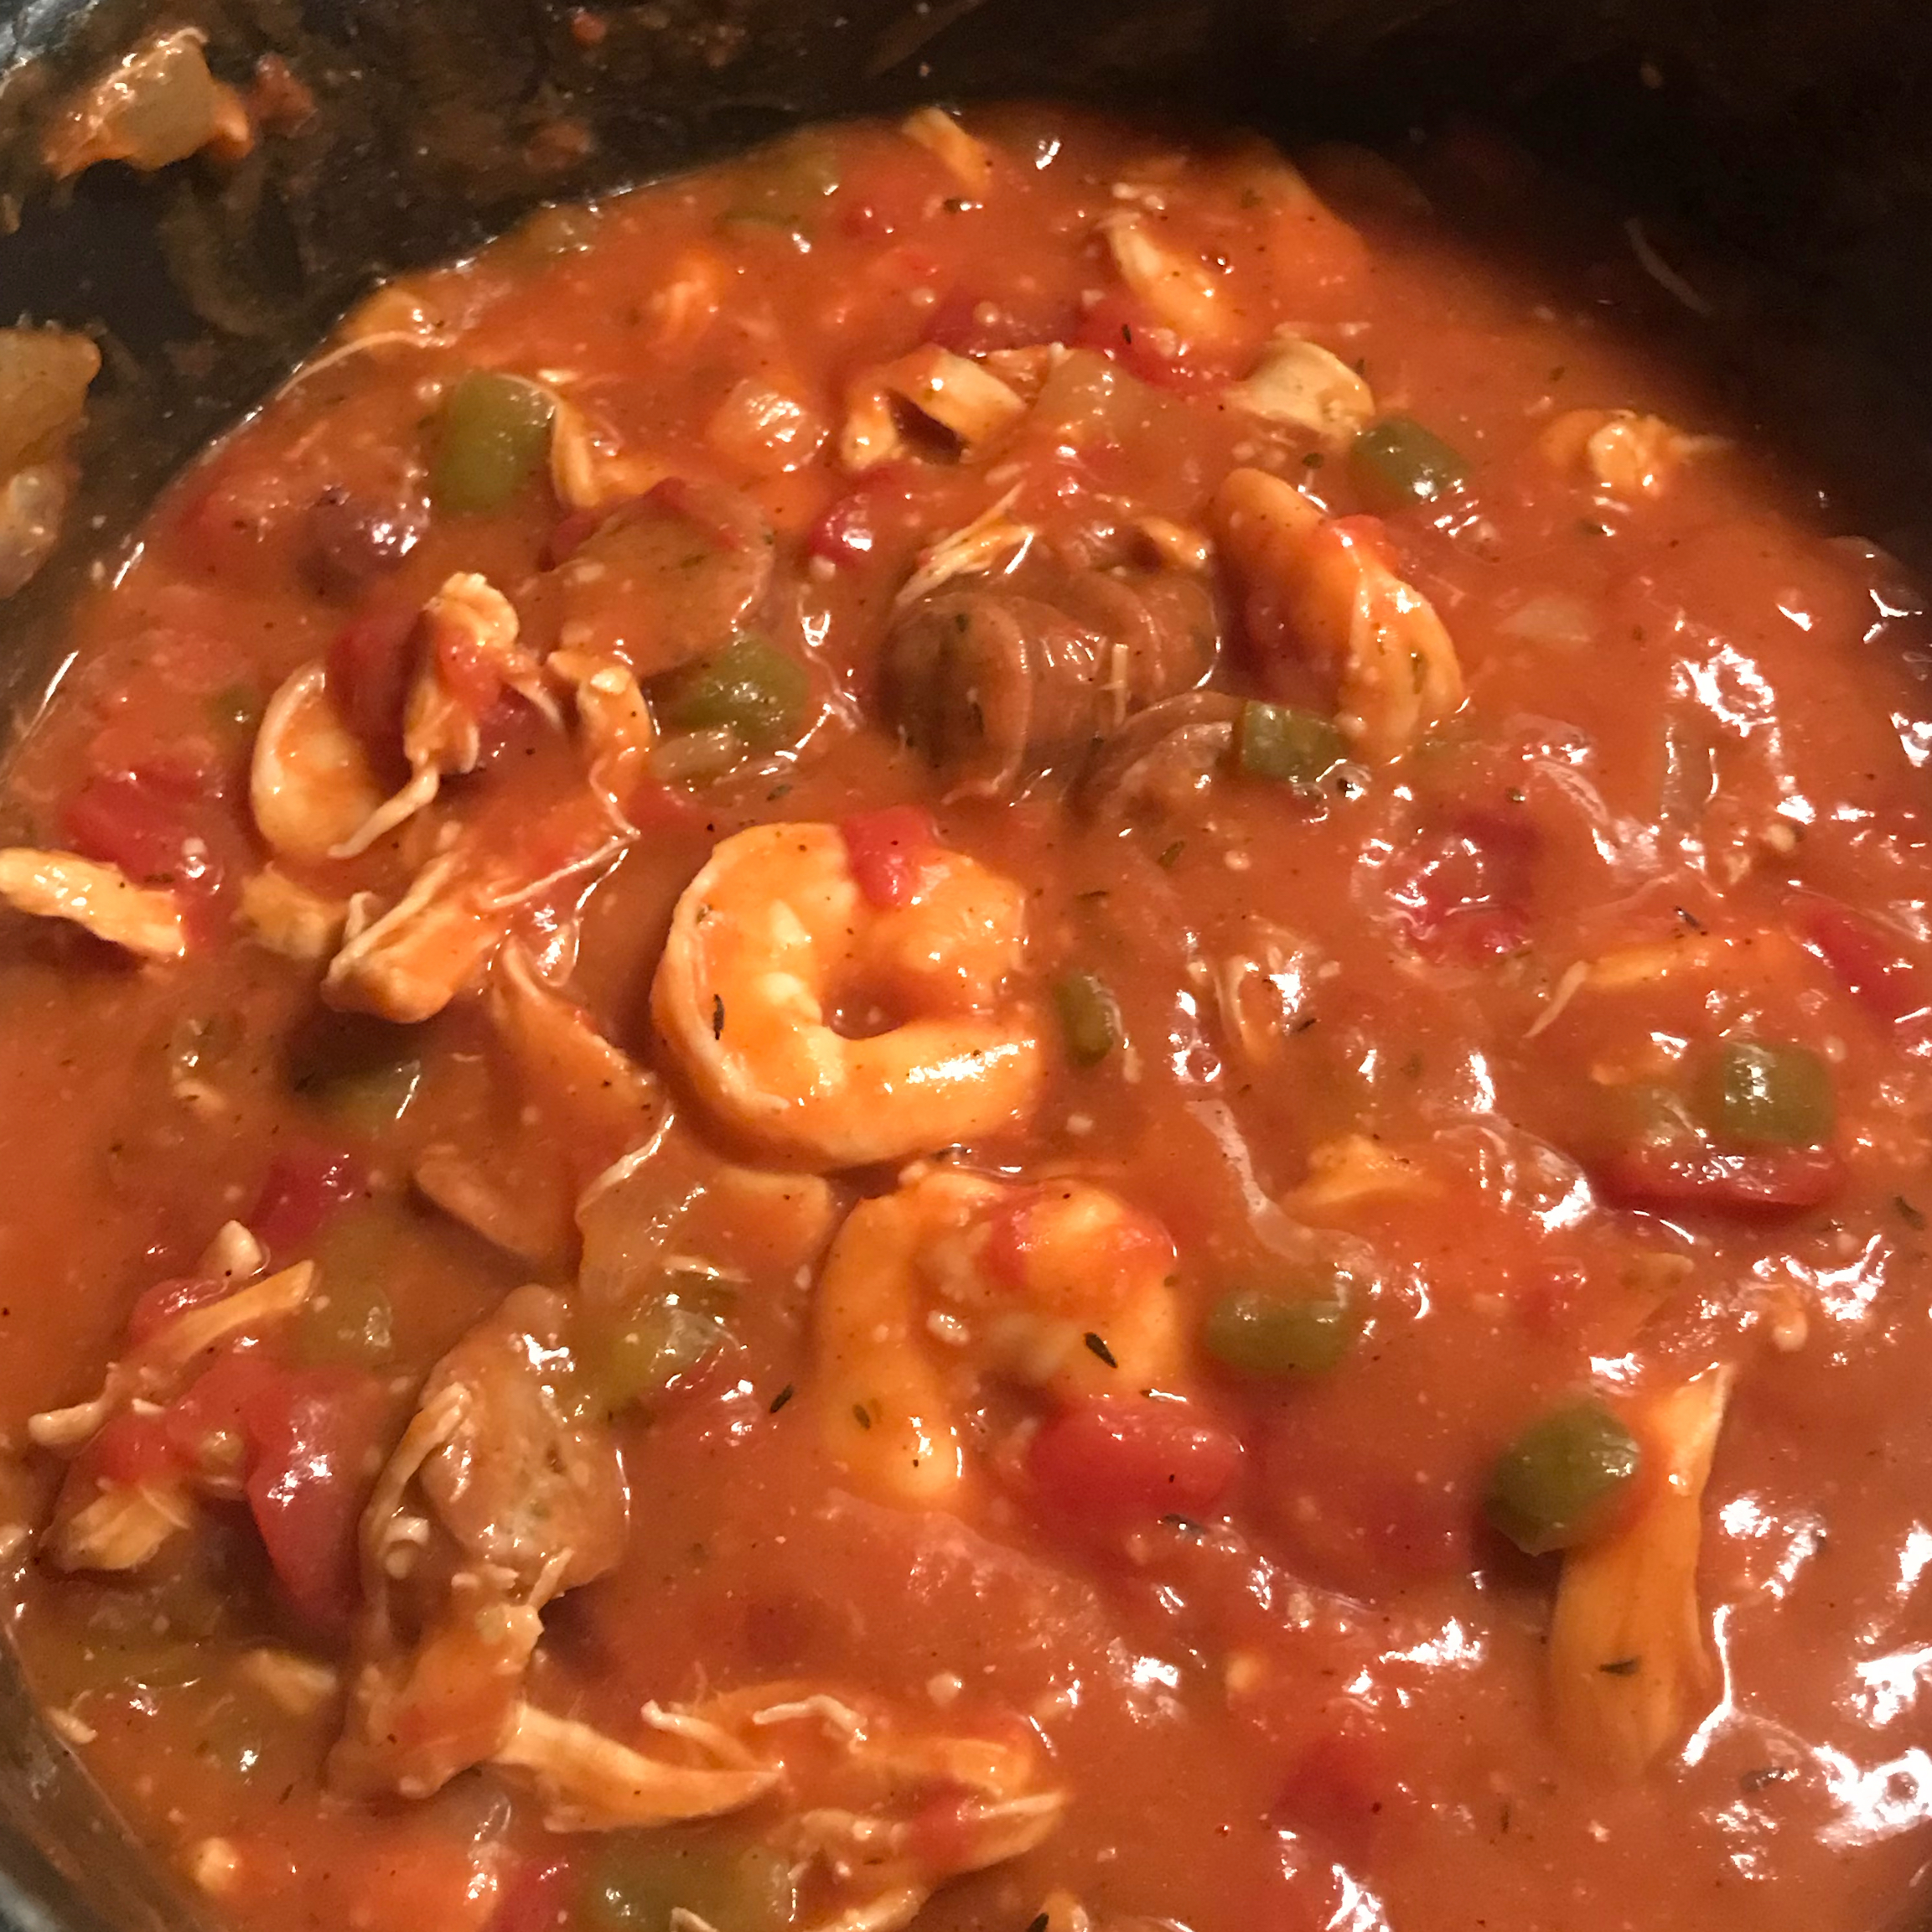 Shrimp and Sausage and Chicken Gumbo grayduane07